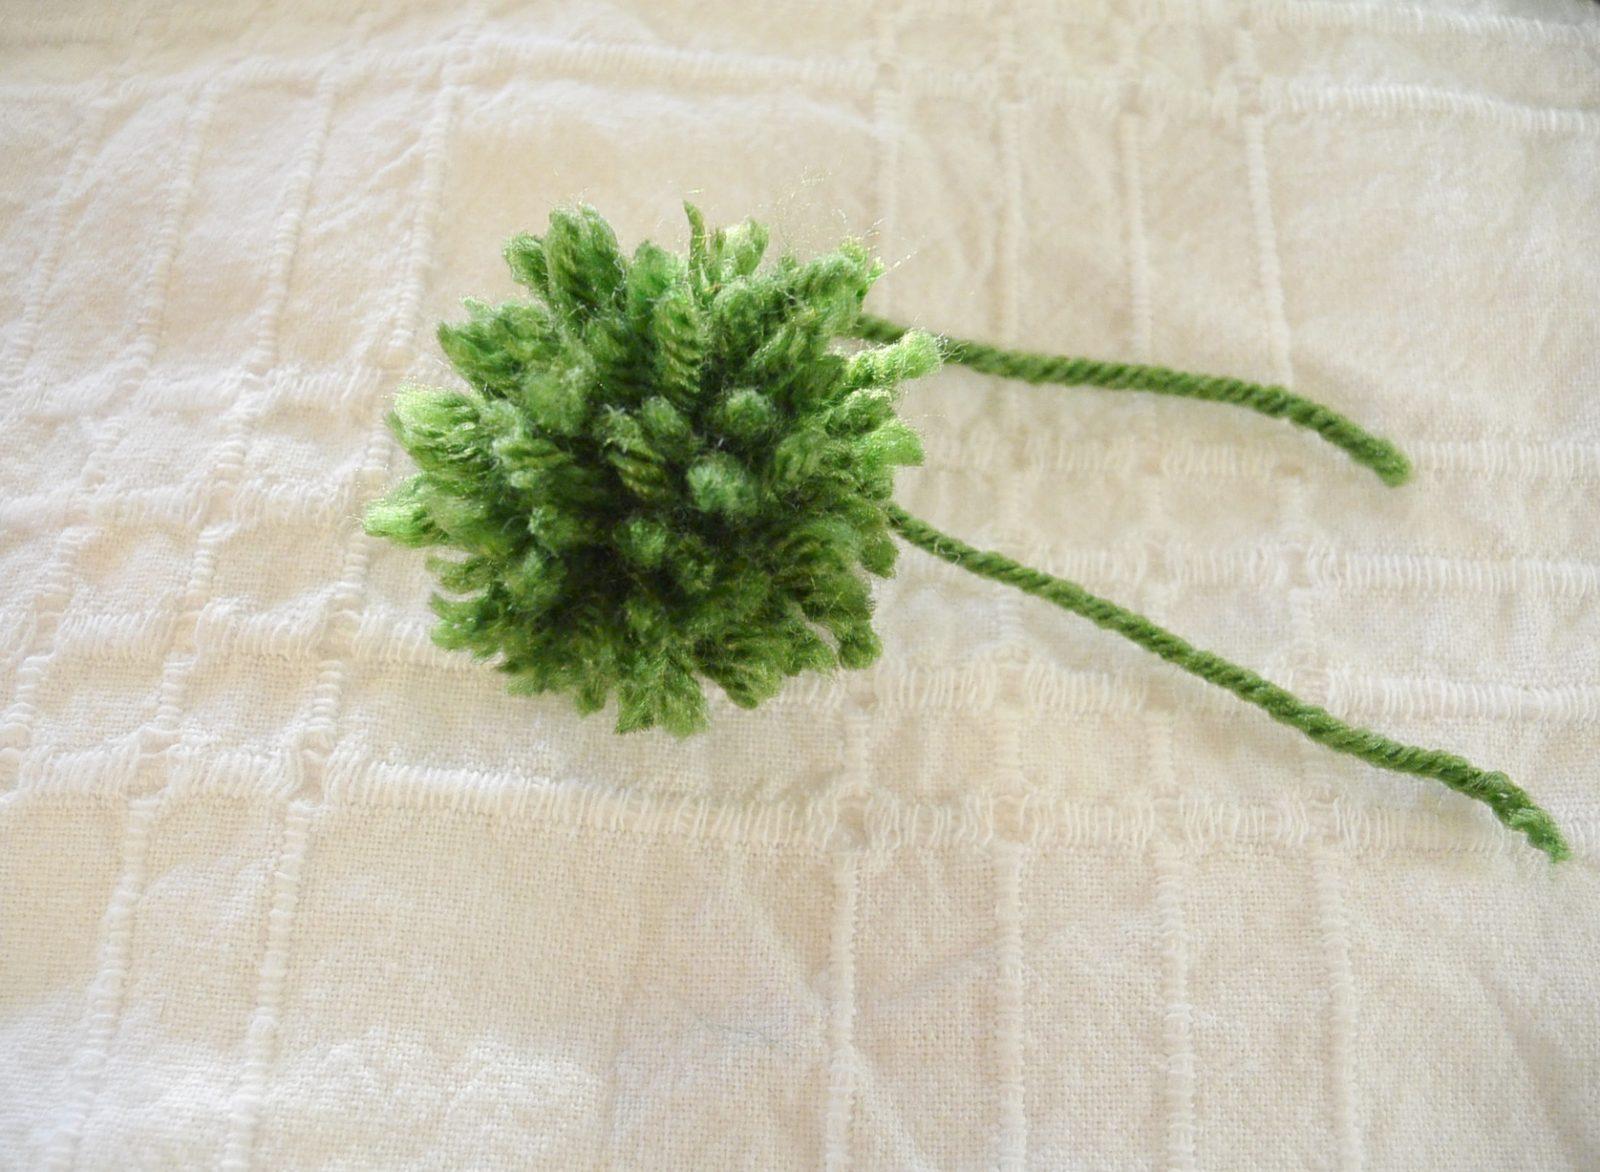 How to Make An Easy Pom-Pom with Yarn